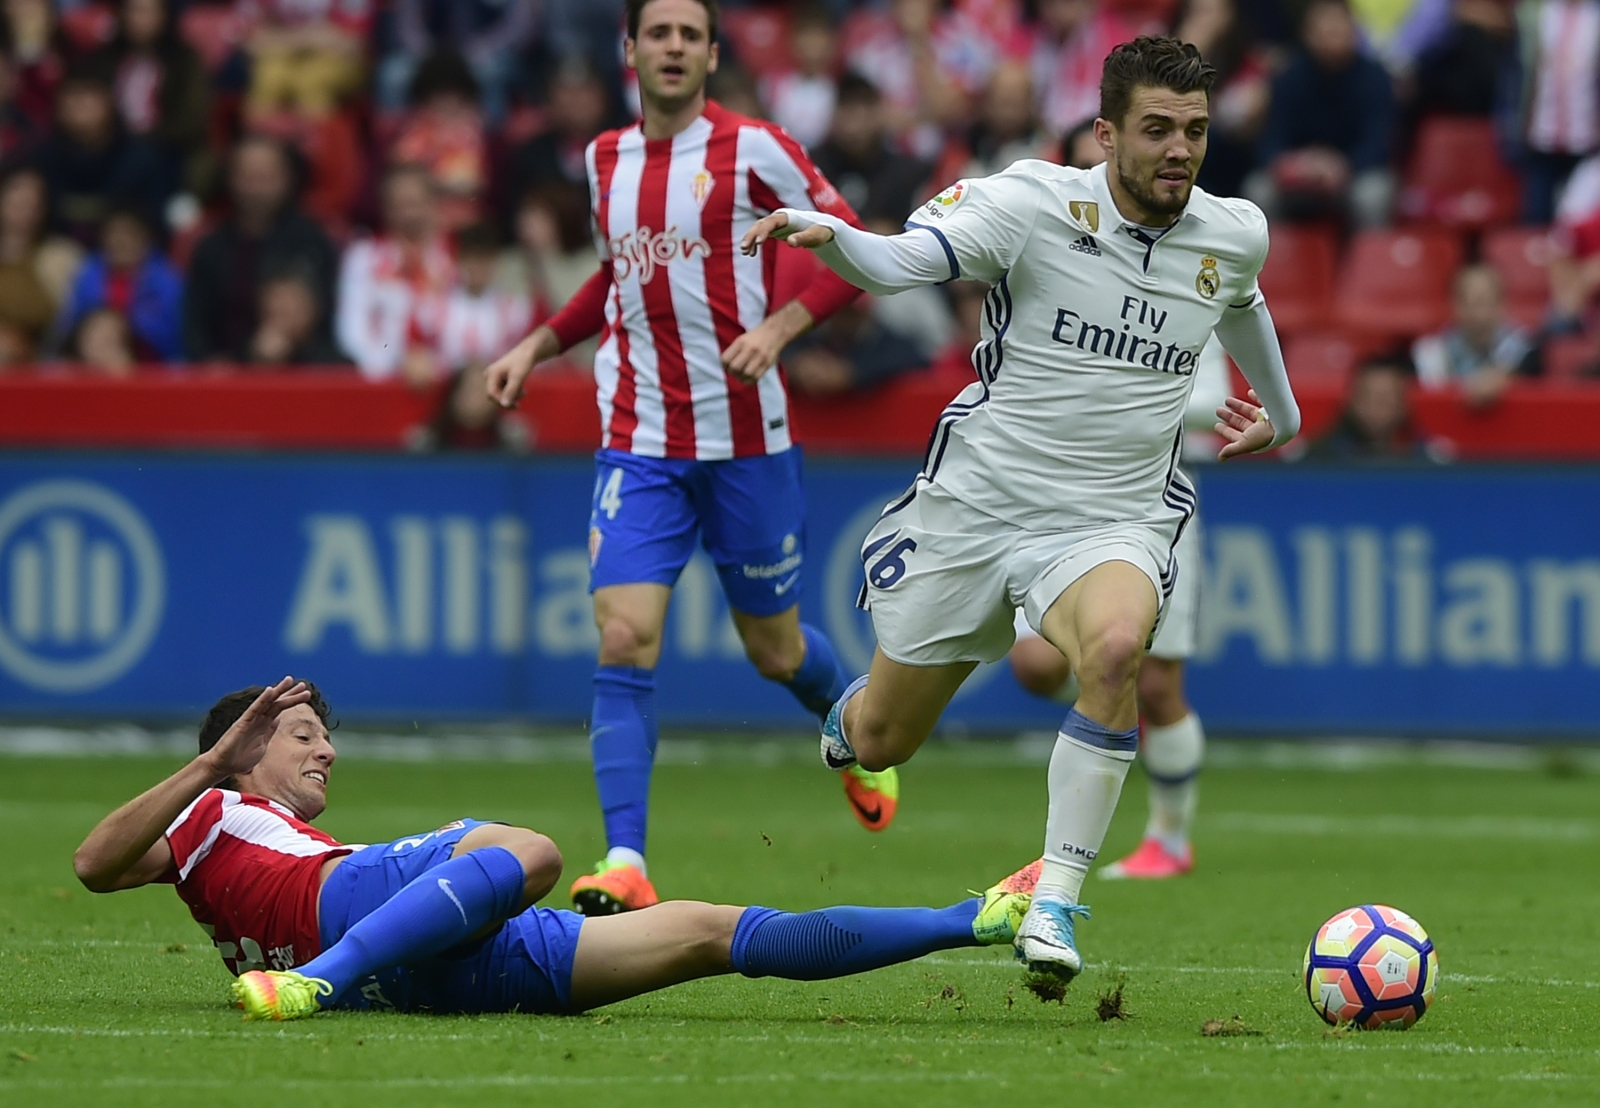 Spurs Transfers: €25 Million Bid For Real Madrid's Mateo Kovacic